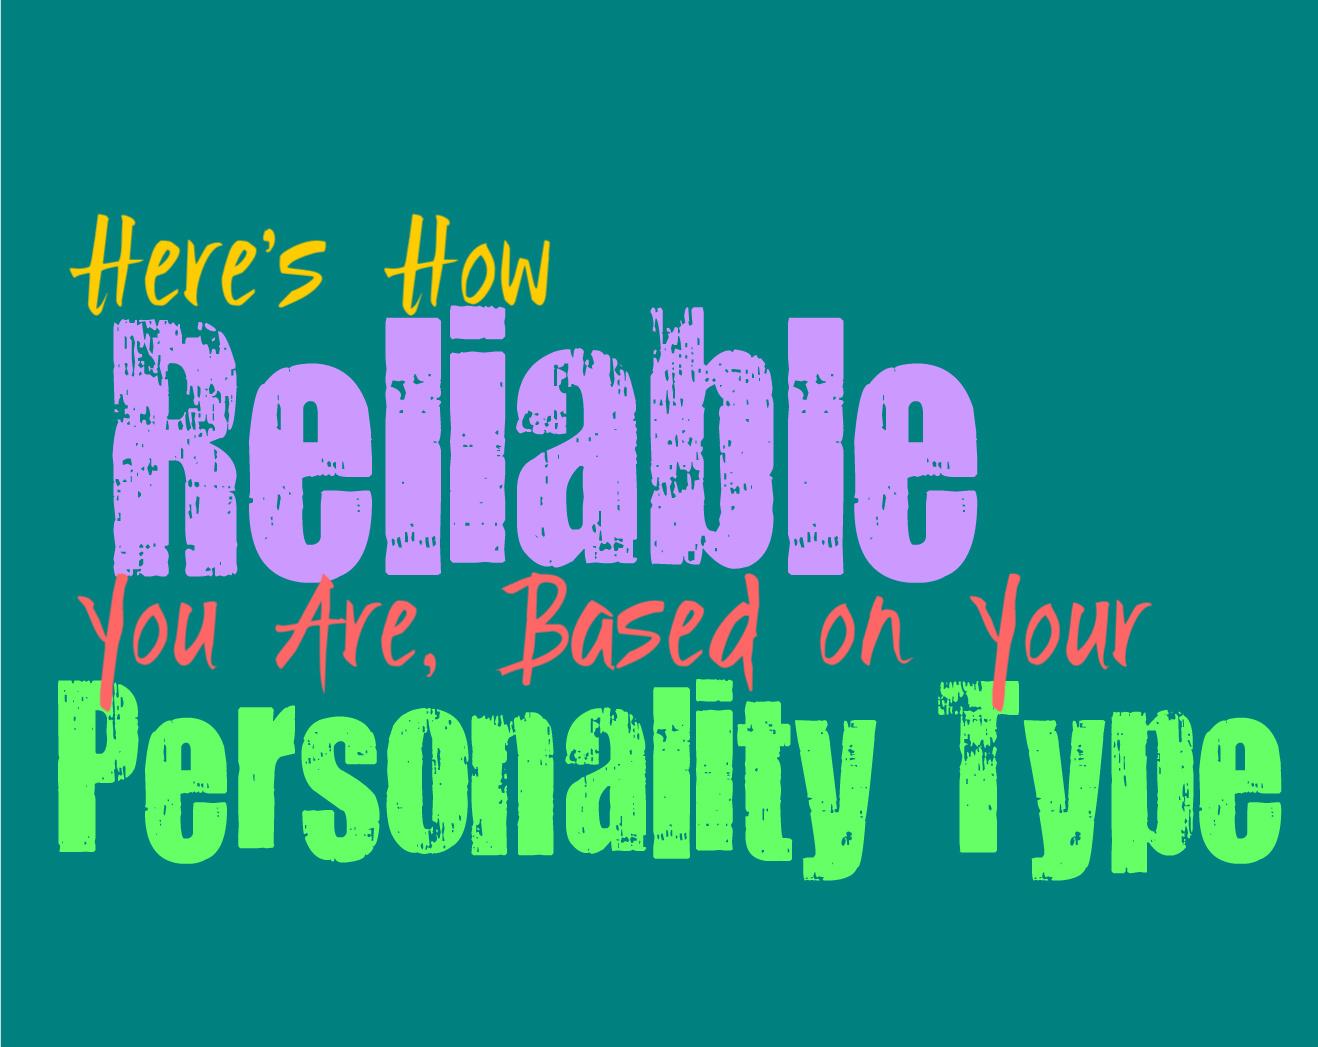 Flighty personality type